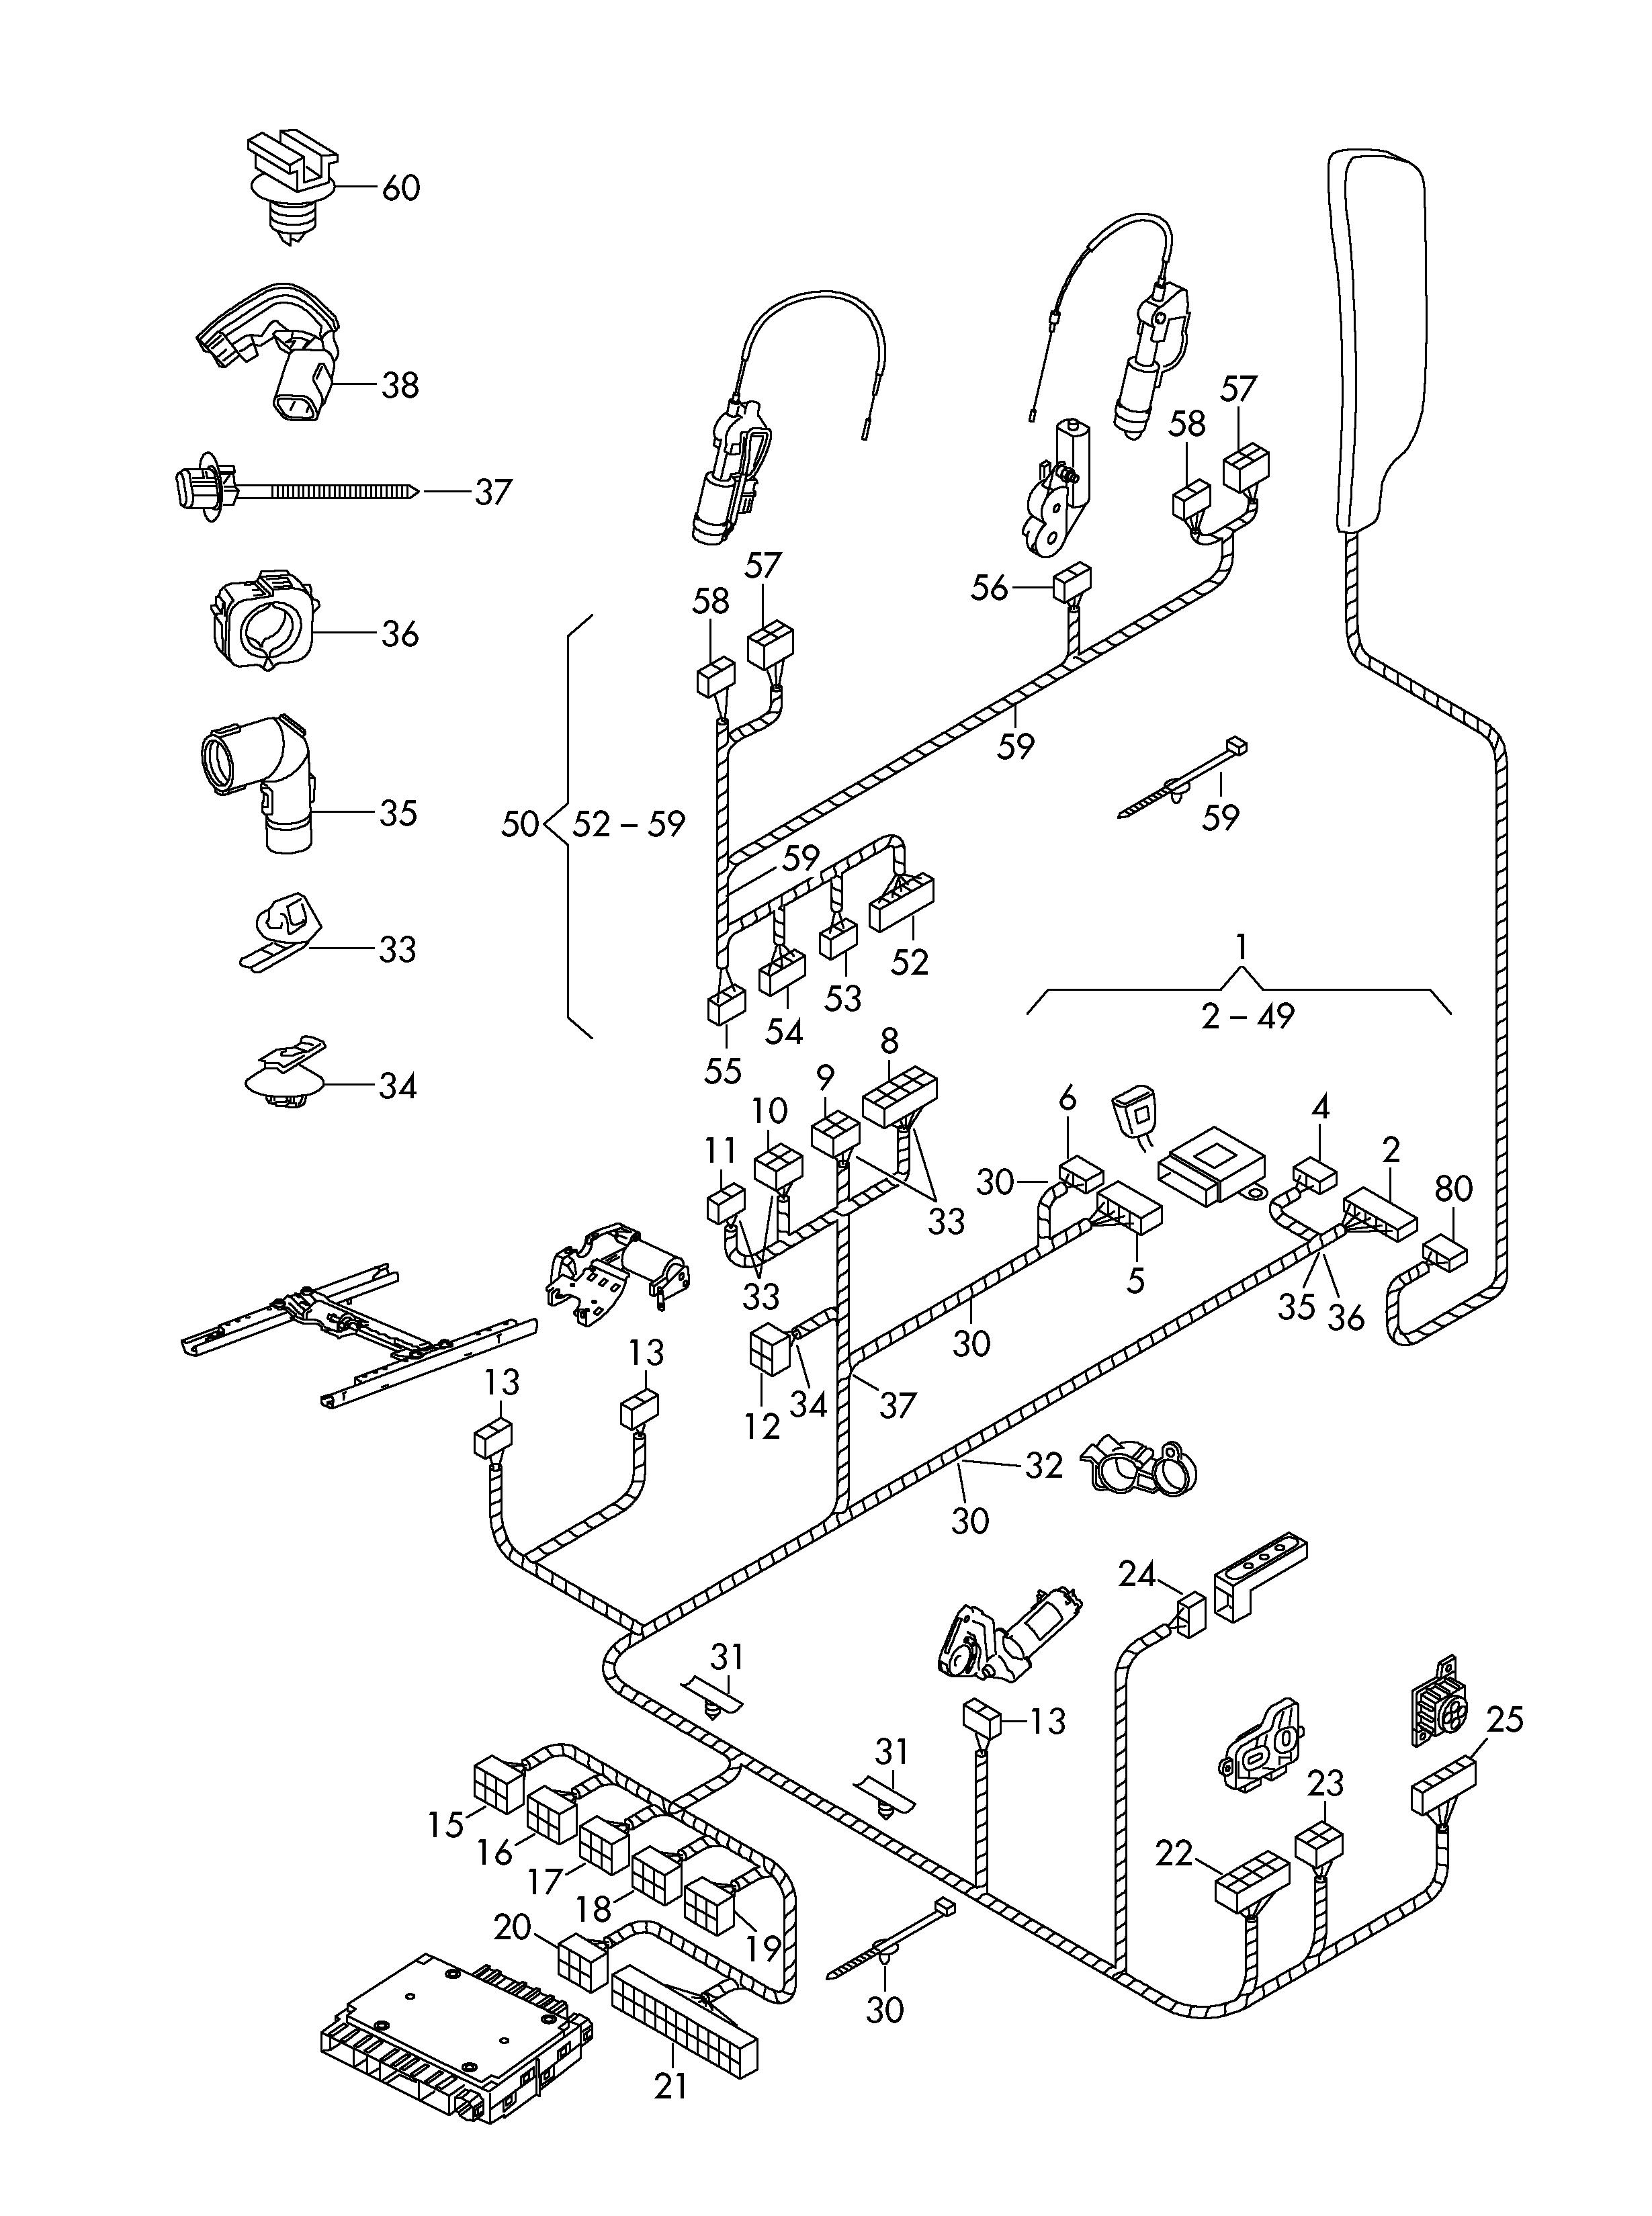 Skoda Superb Ccm Wiring Diagram - 2006 Chevy Impala Wiring Harness -  1991rx7.bmw-in-e46.jeanjaures37.frWiring Diagram Resource